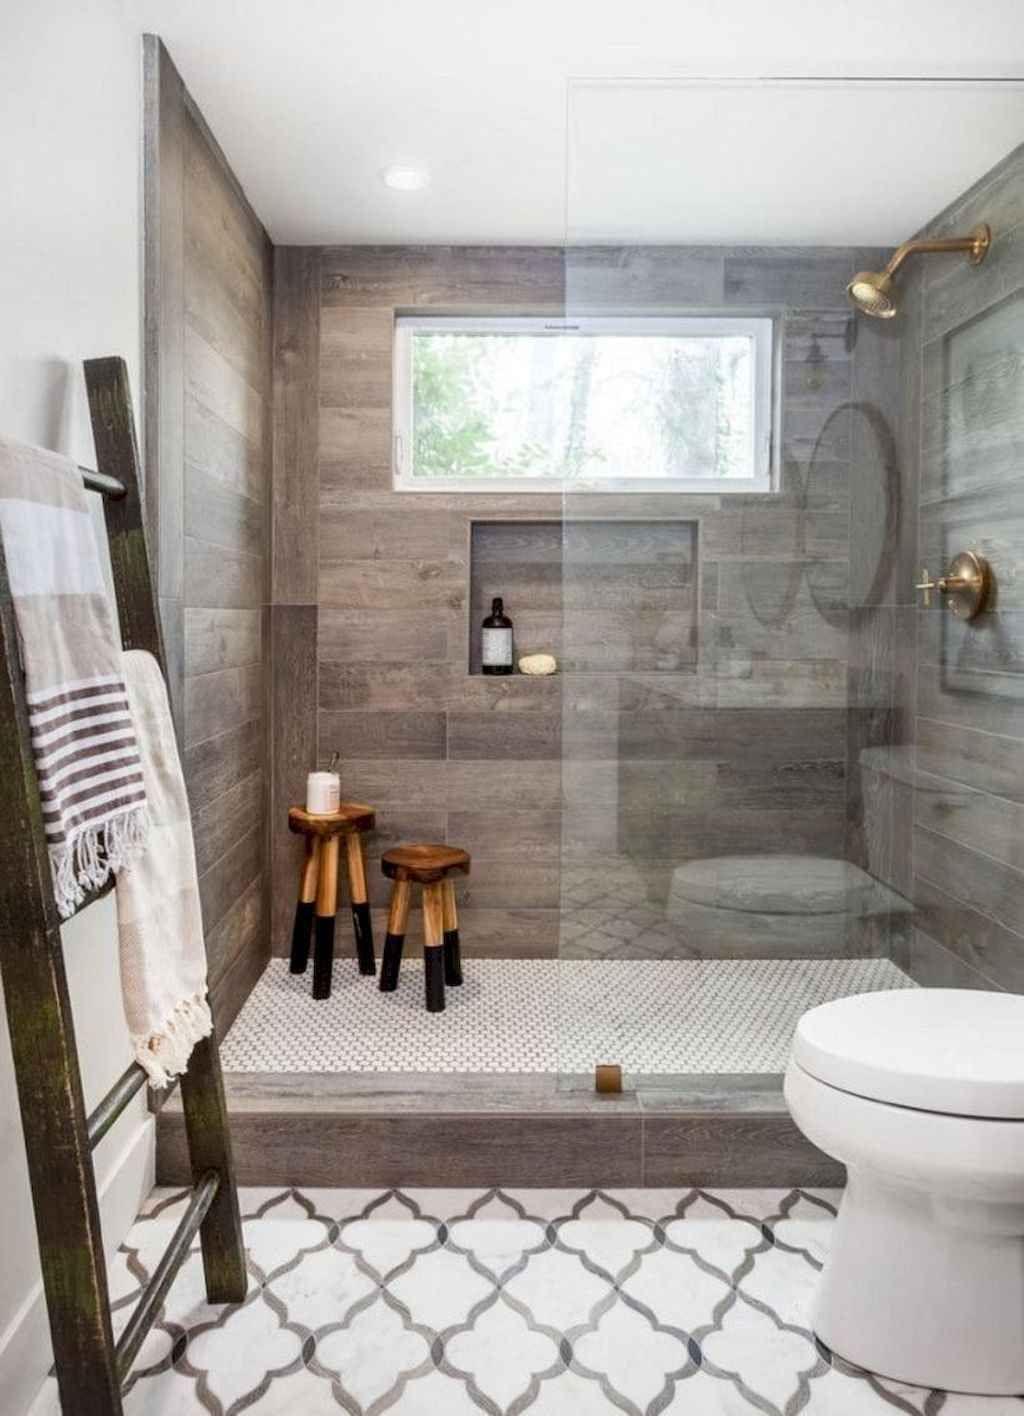 insane farmhouse shower tiles remodel ideas 09 cheap on bathroom renovation ideas modern id=44531